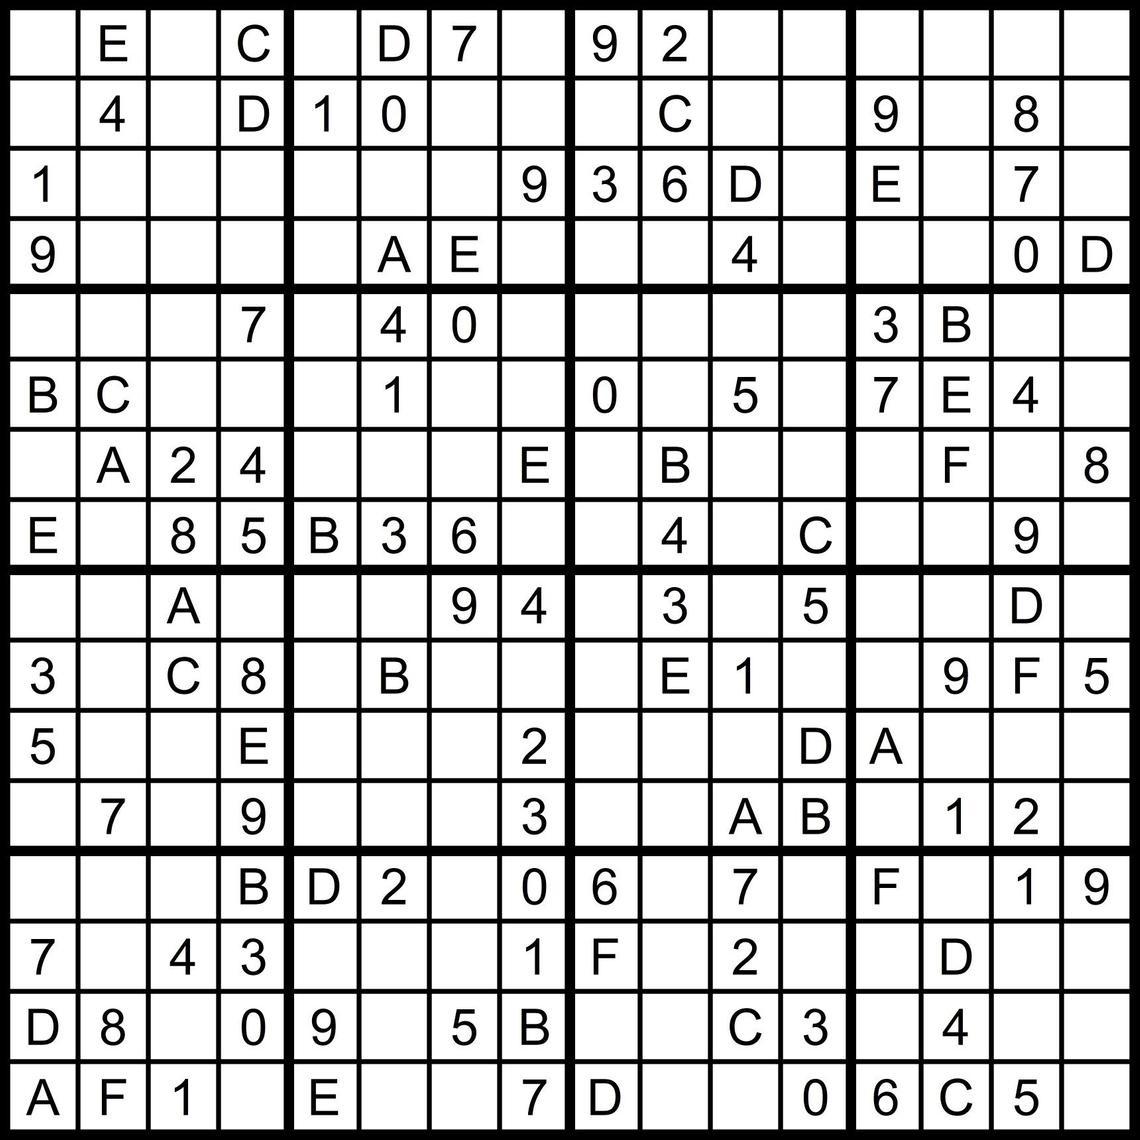 Free Printable Sudoku Challenger Puzzles